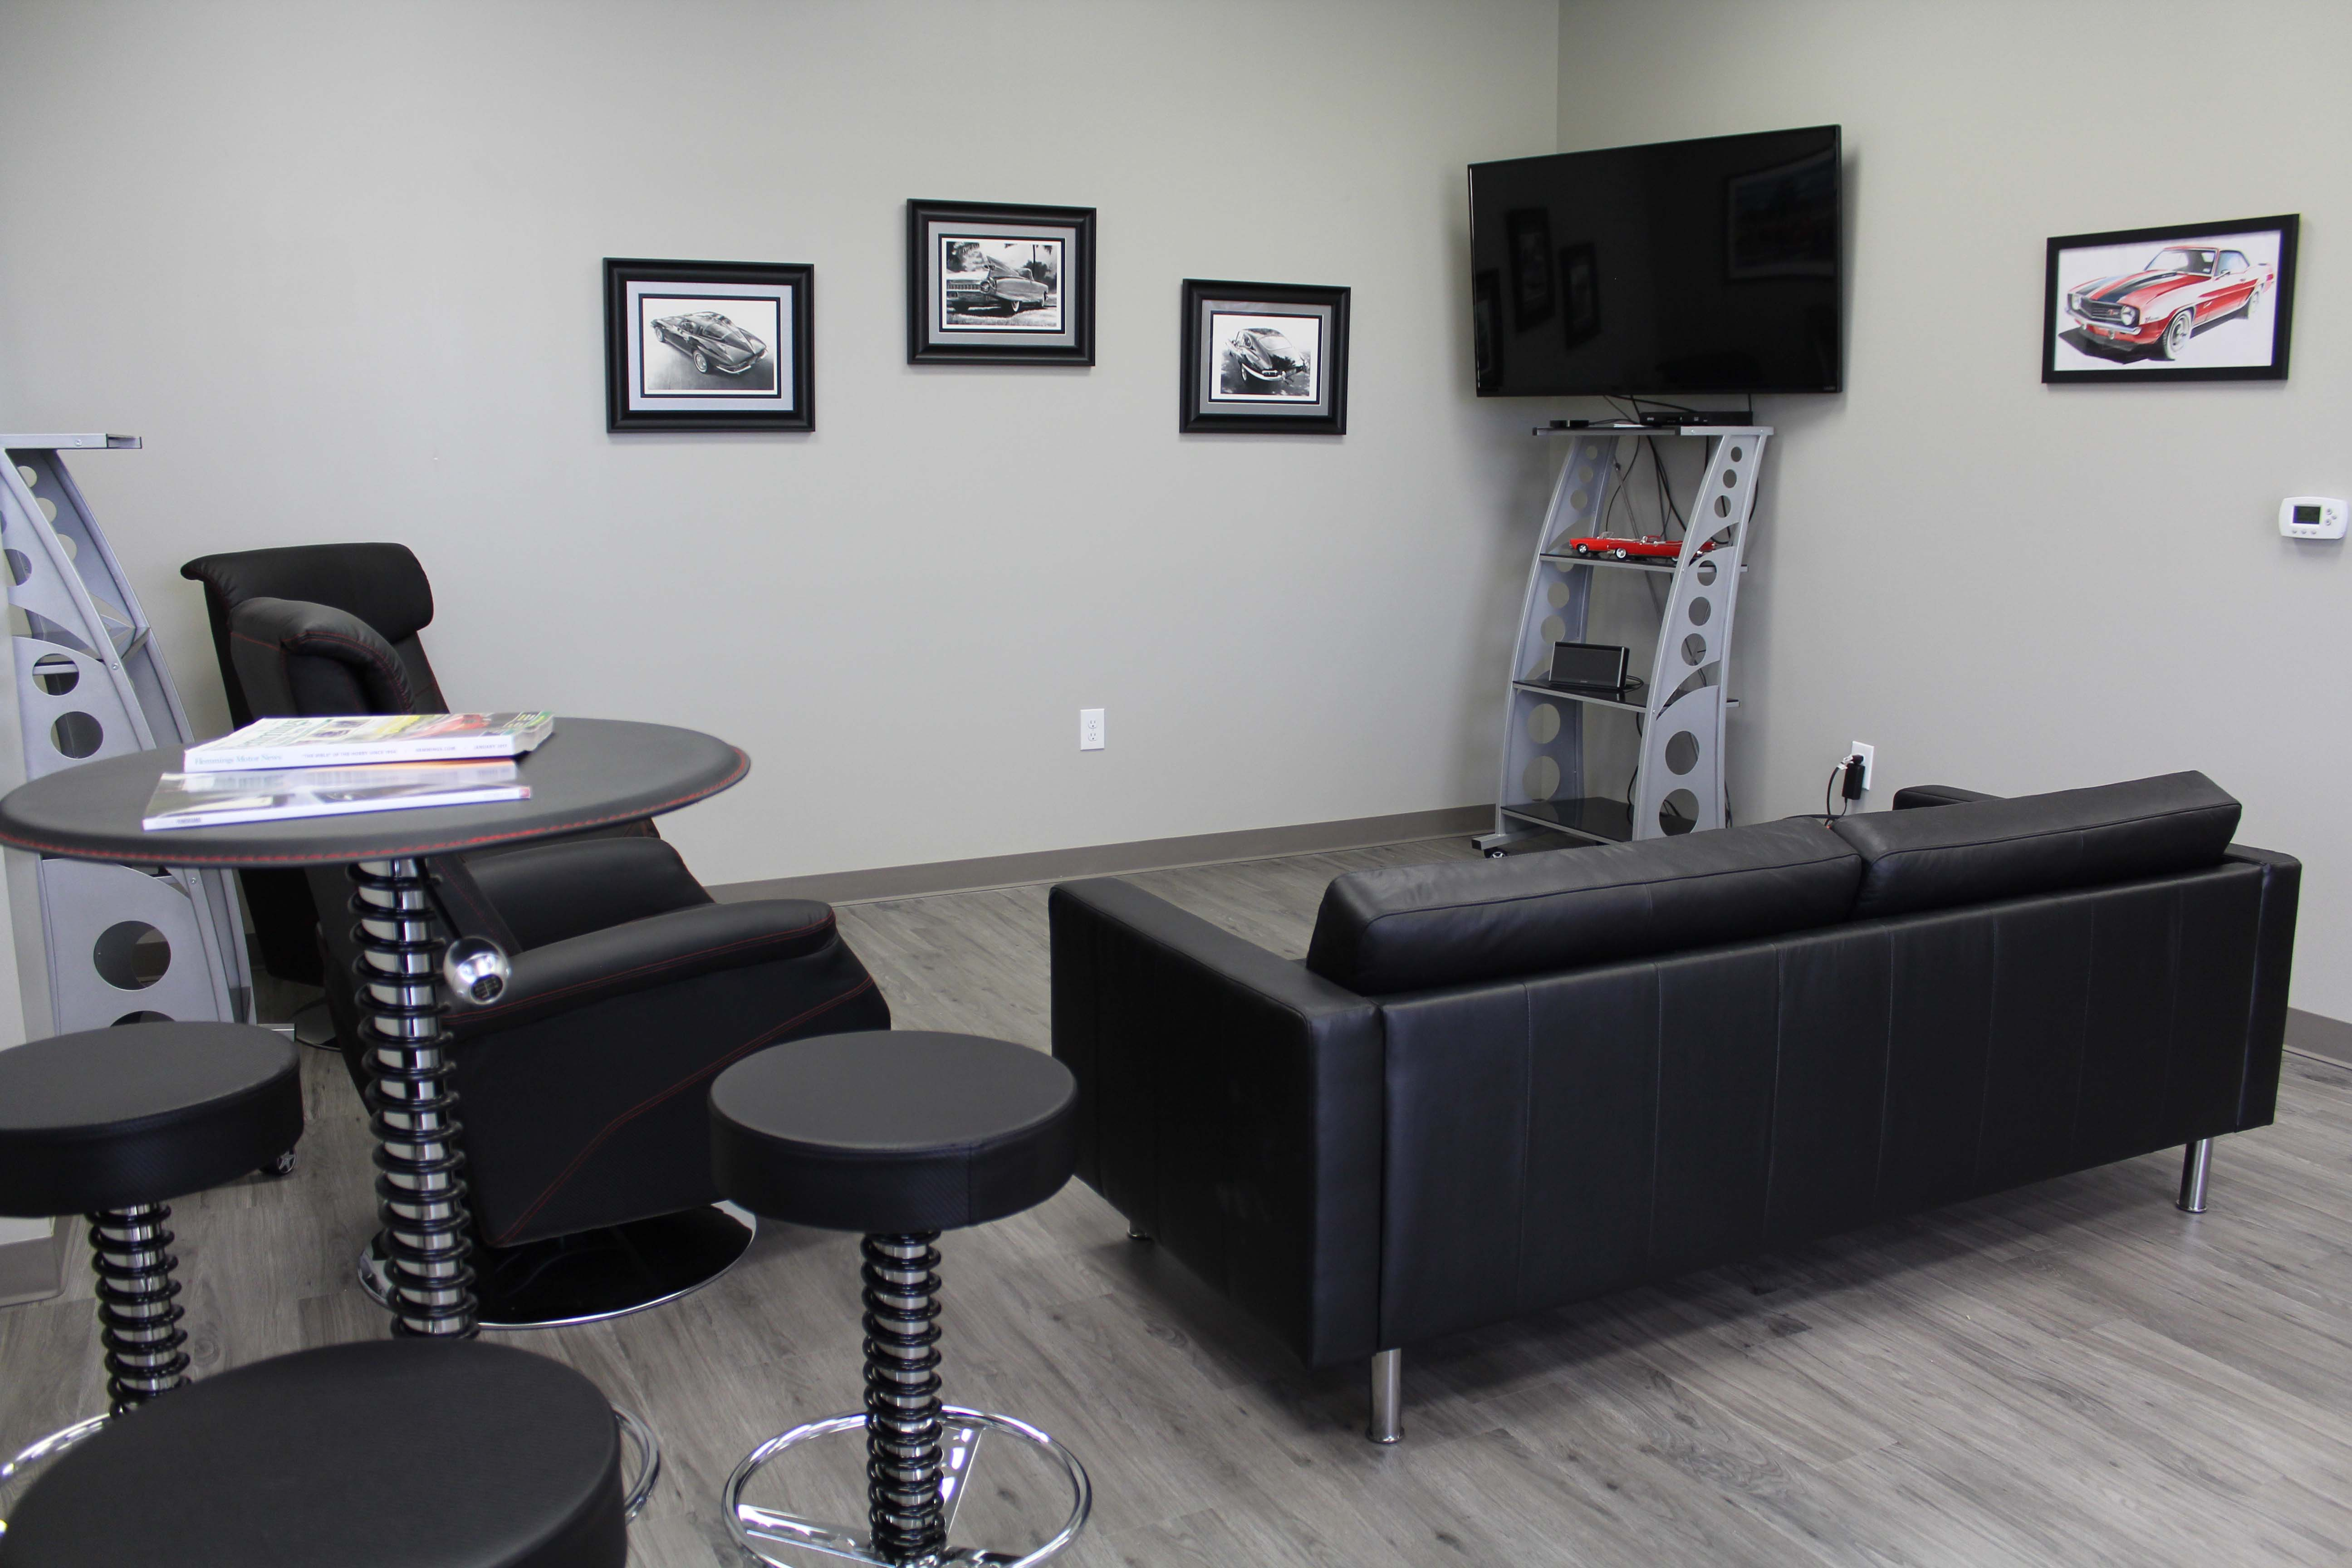 IMG_8750 - Lounge Area1